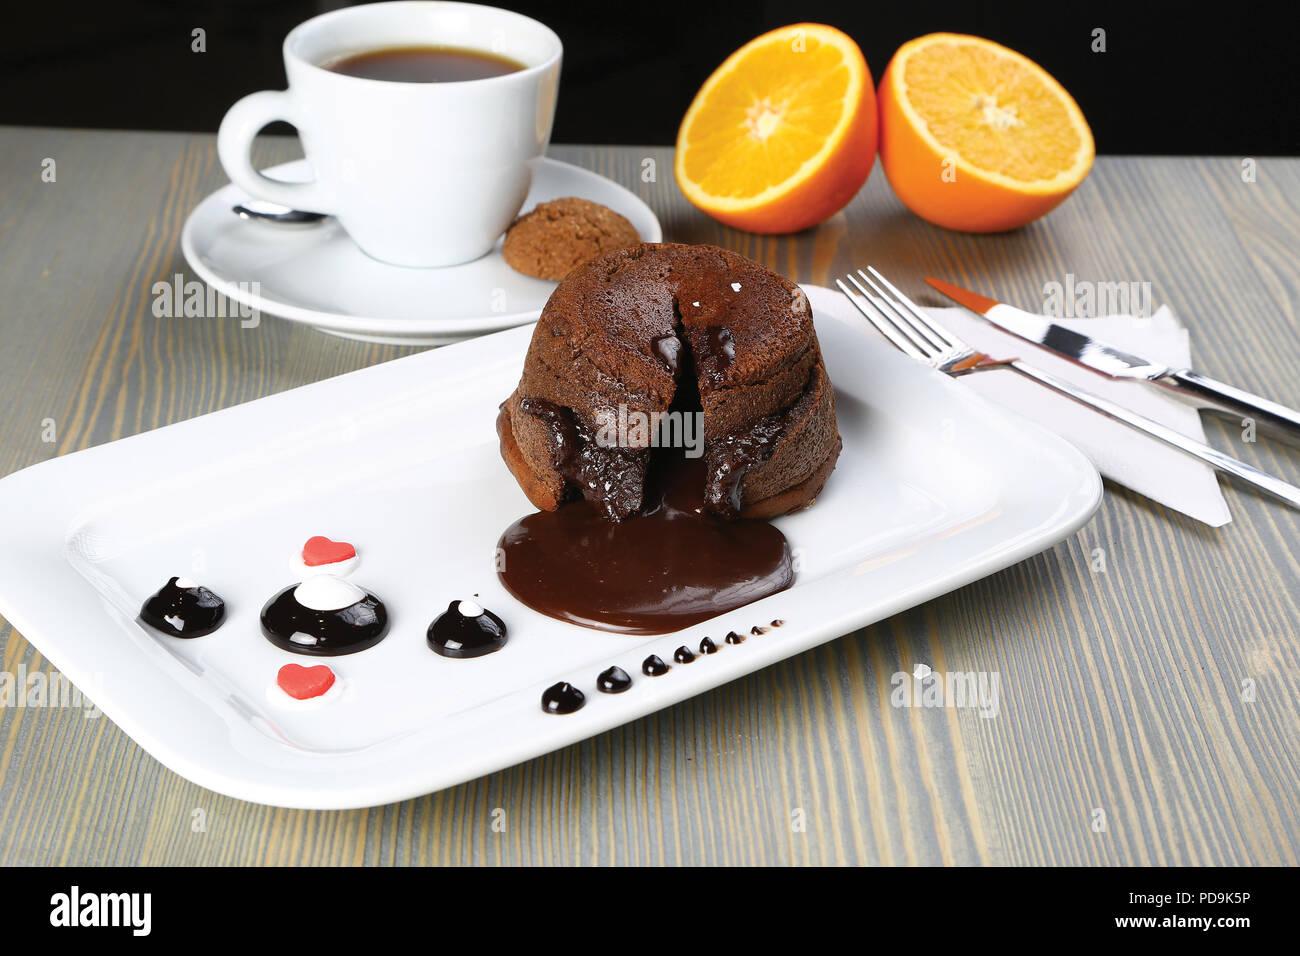 Homemade Chocolate Lava Cake Dessert, Fondant Lava Cake - Stock Image